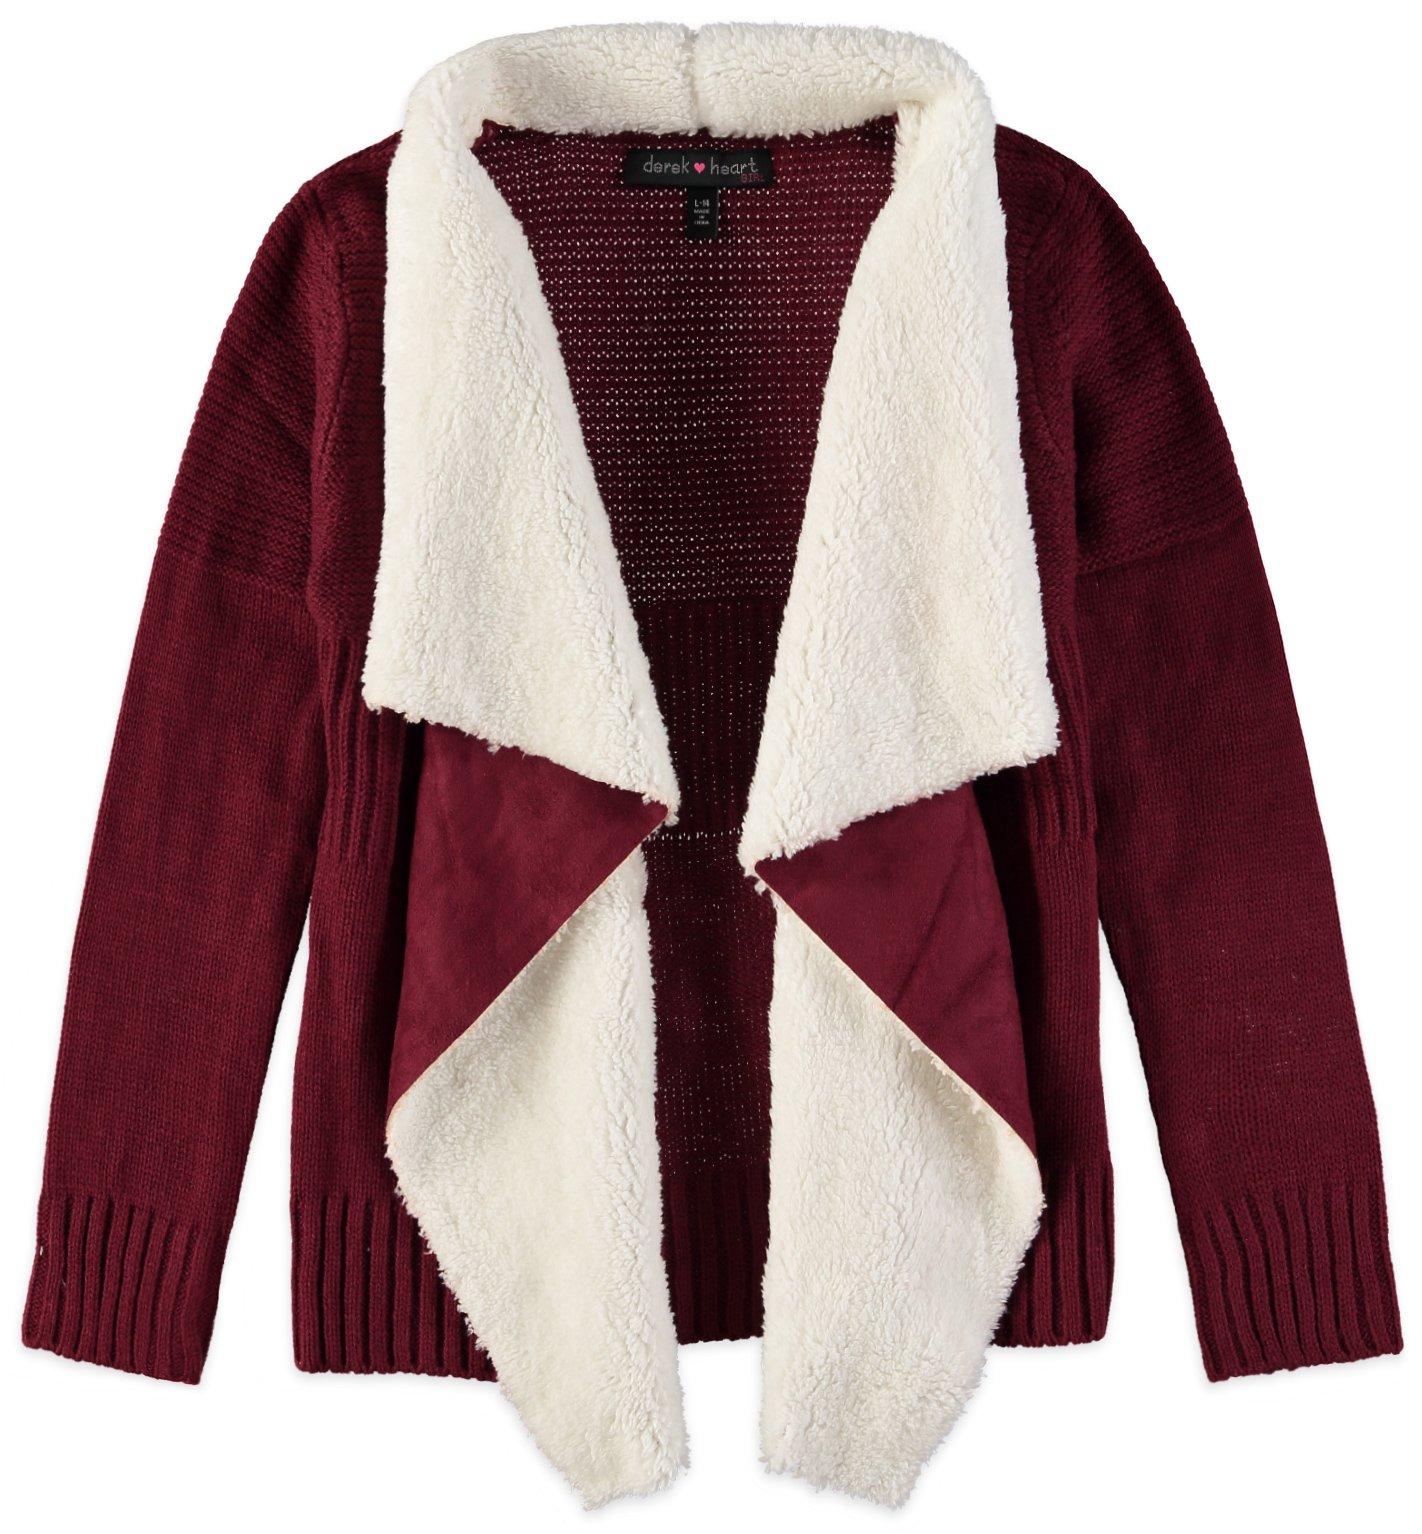 Derek Heart Big Girls' Long SLV Mixed Stitch Open FRT Cozy with Sherpa Collar, Burgundy/Cloud Cream, Large/14